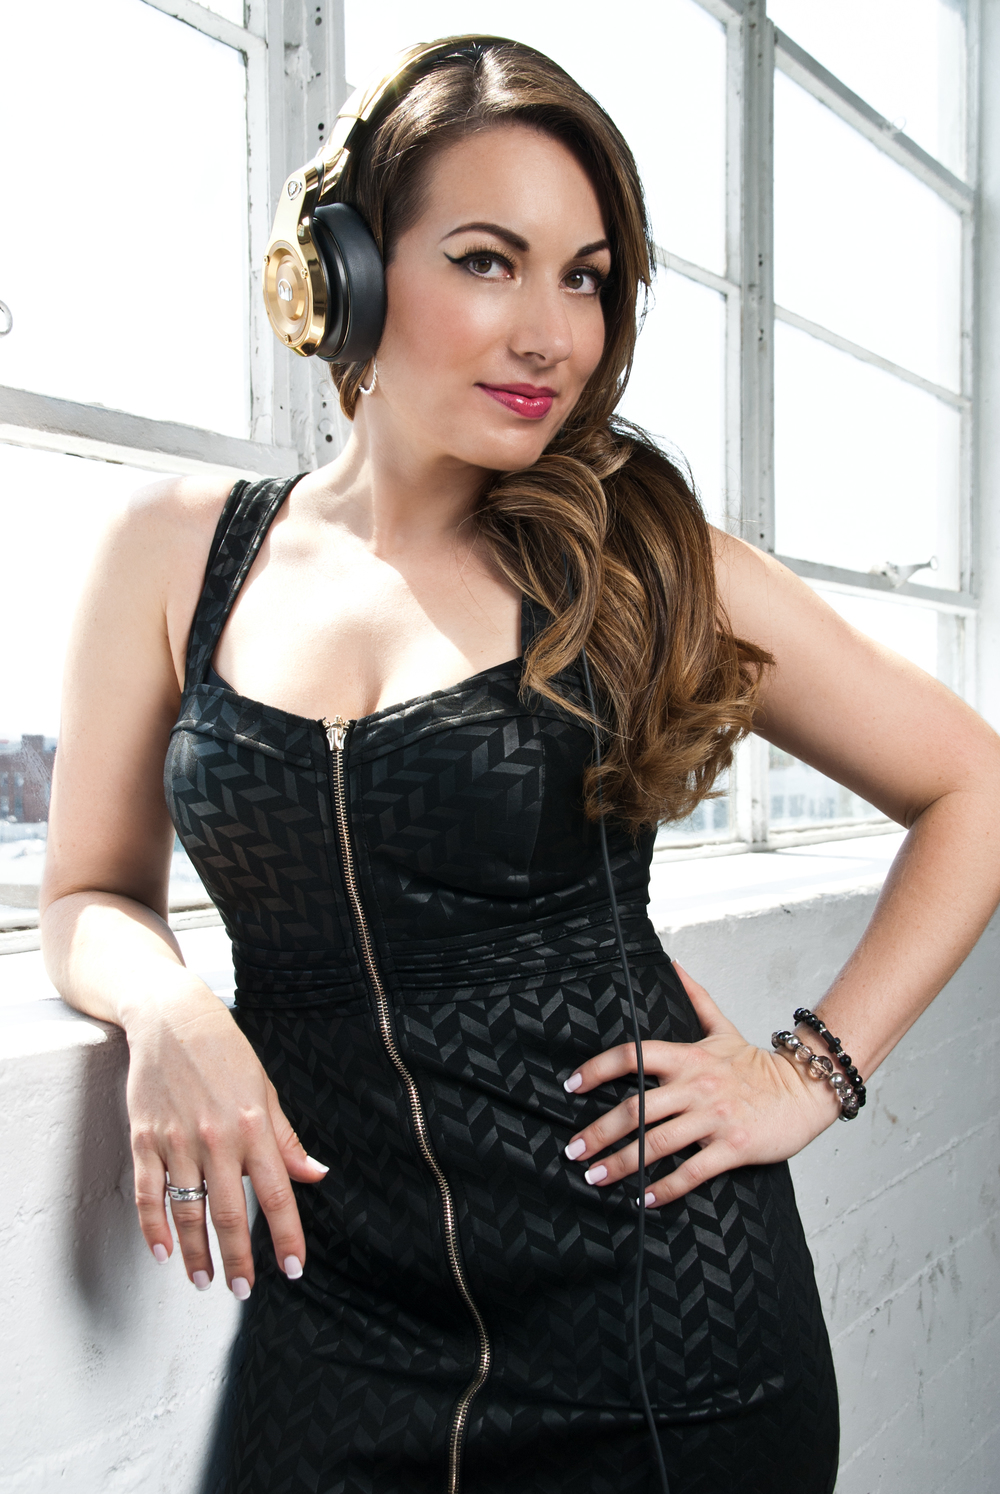 DJ Brandi Garcia, 93.5KDAY Los Angeles, CA